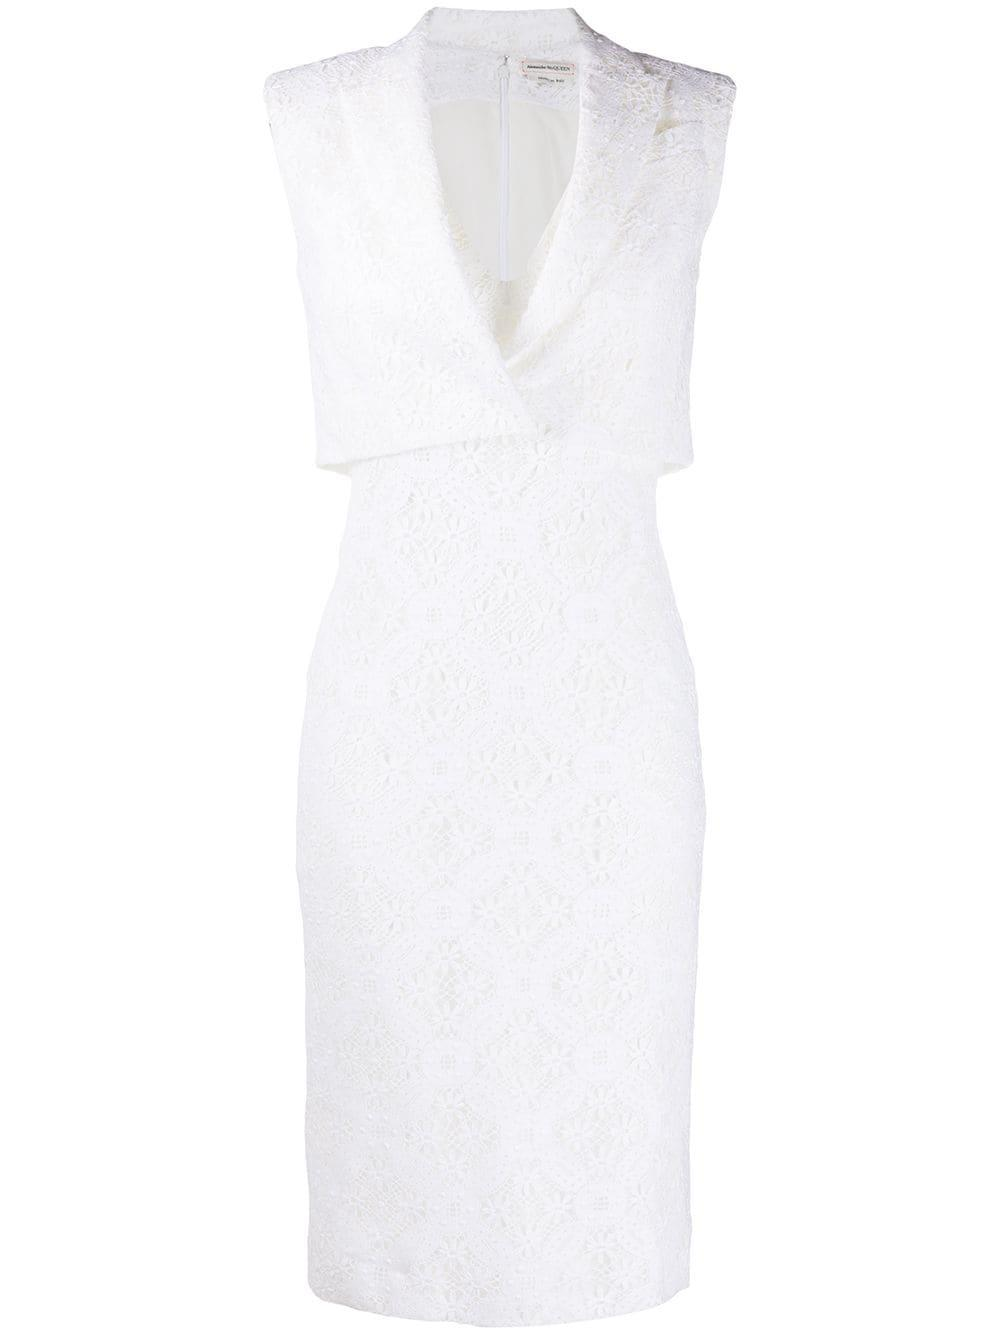 Layered Lace V- Neck Dress Item # 620429QEABP